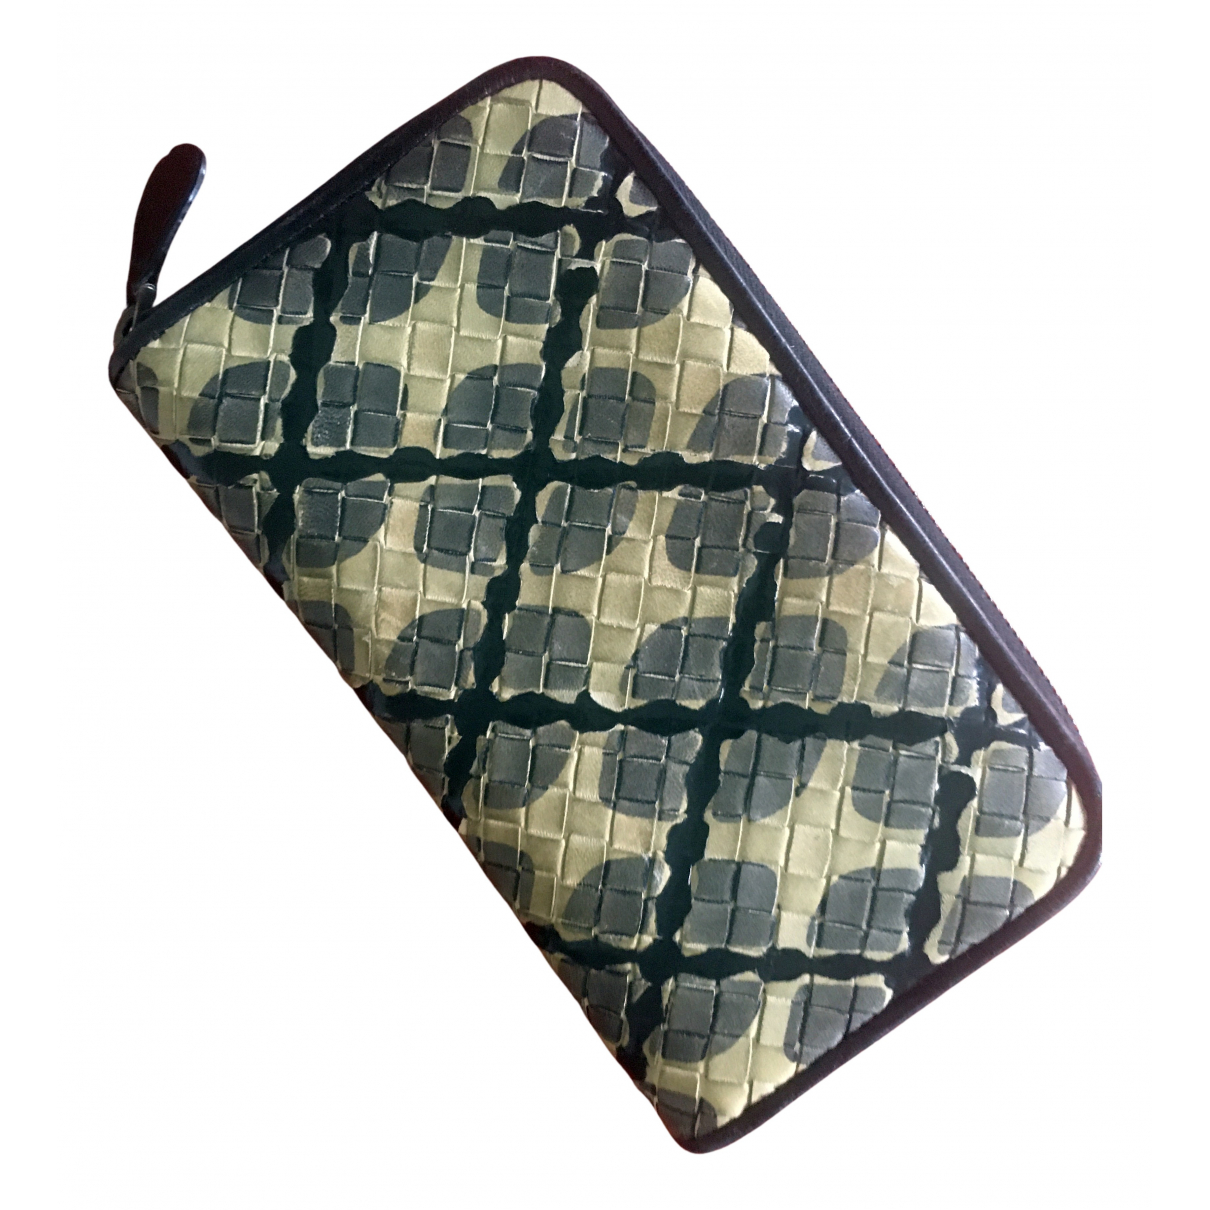 Bottega Veneta Intrecciato Green Leather wallet for Women N